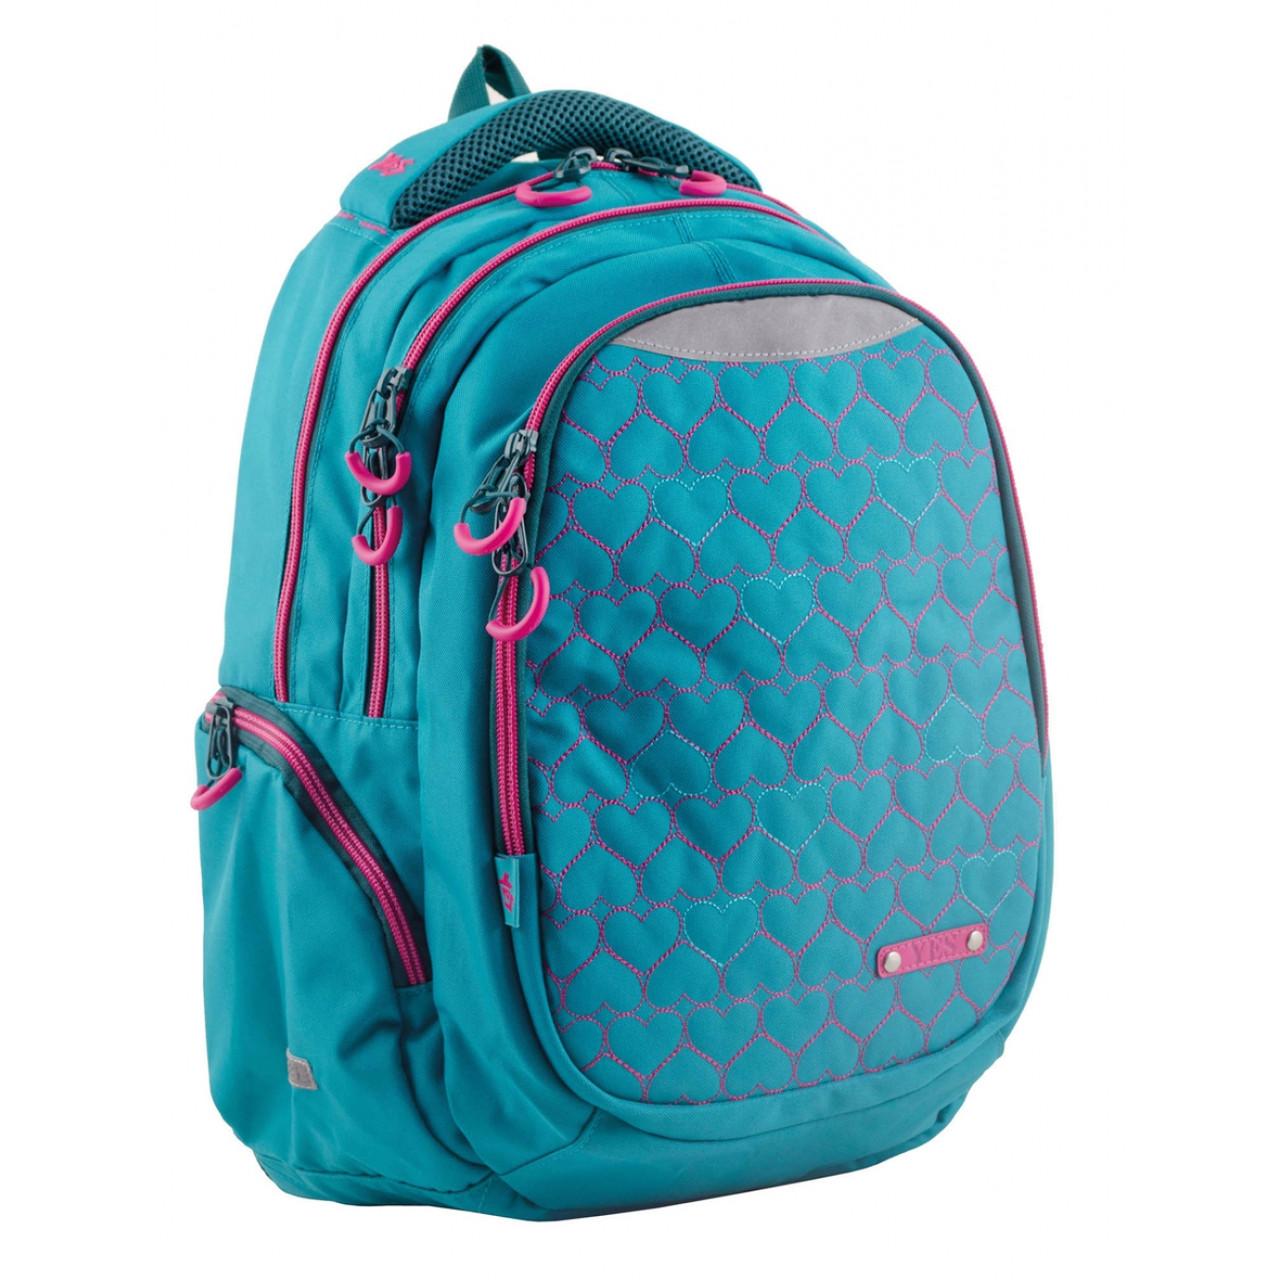 Рюкзак подростковый Т-22 Mint hearts, 43*30*15